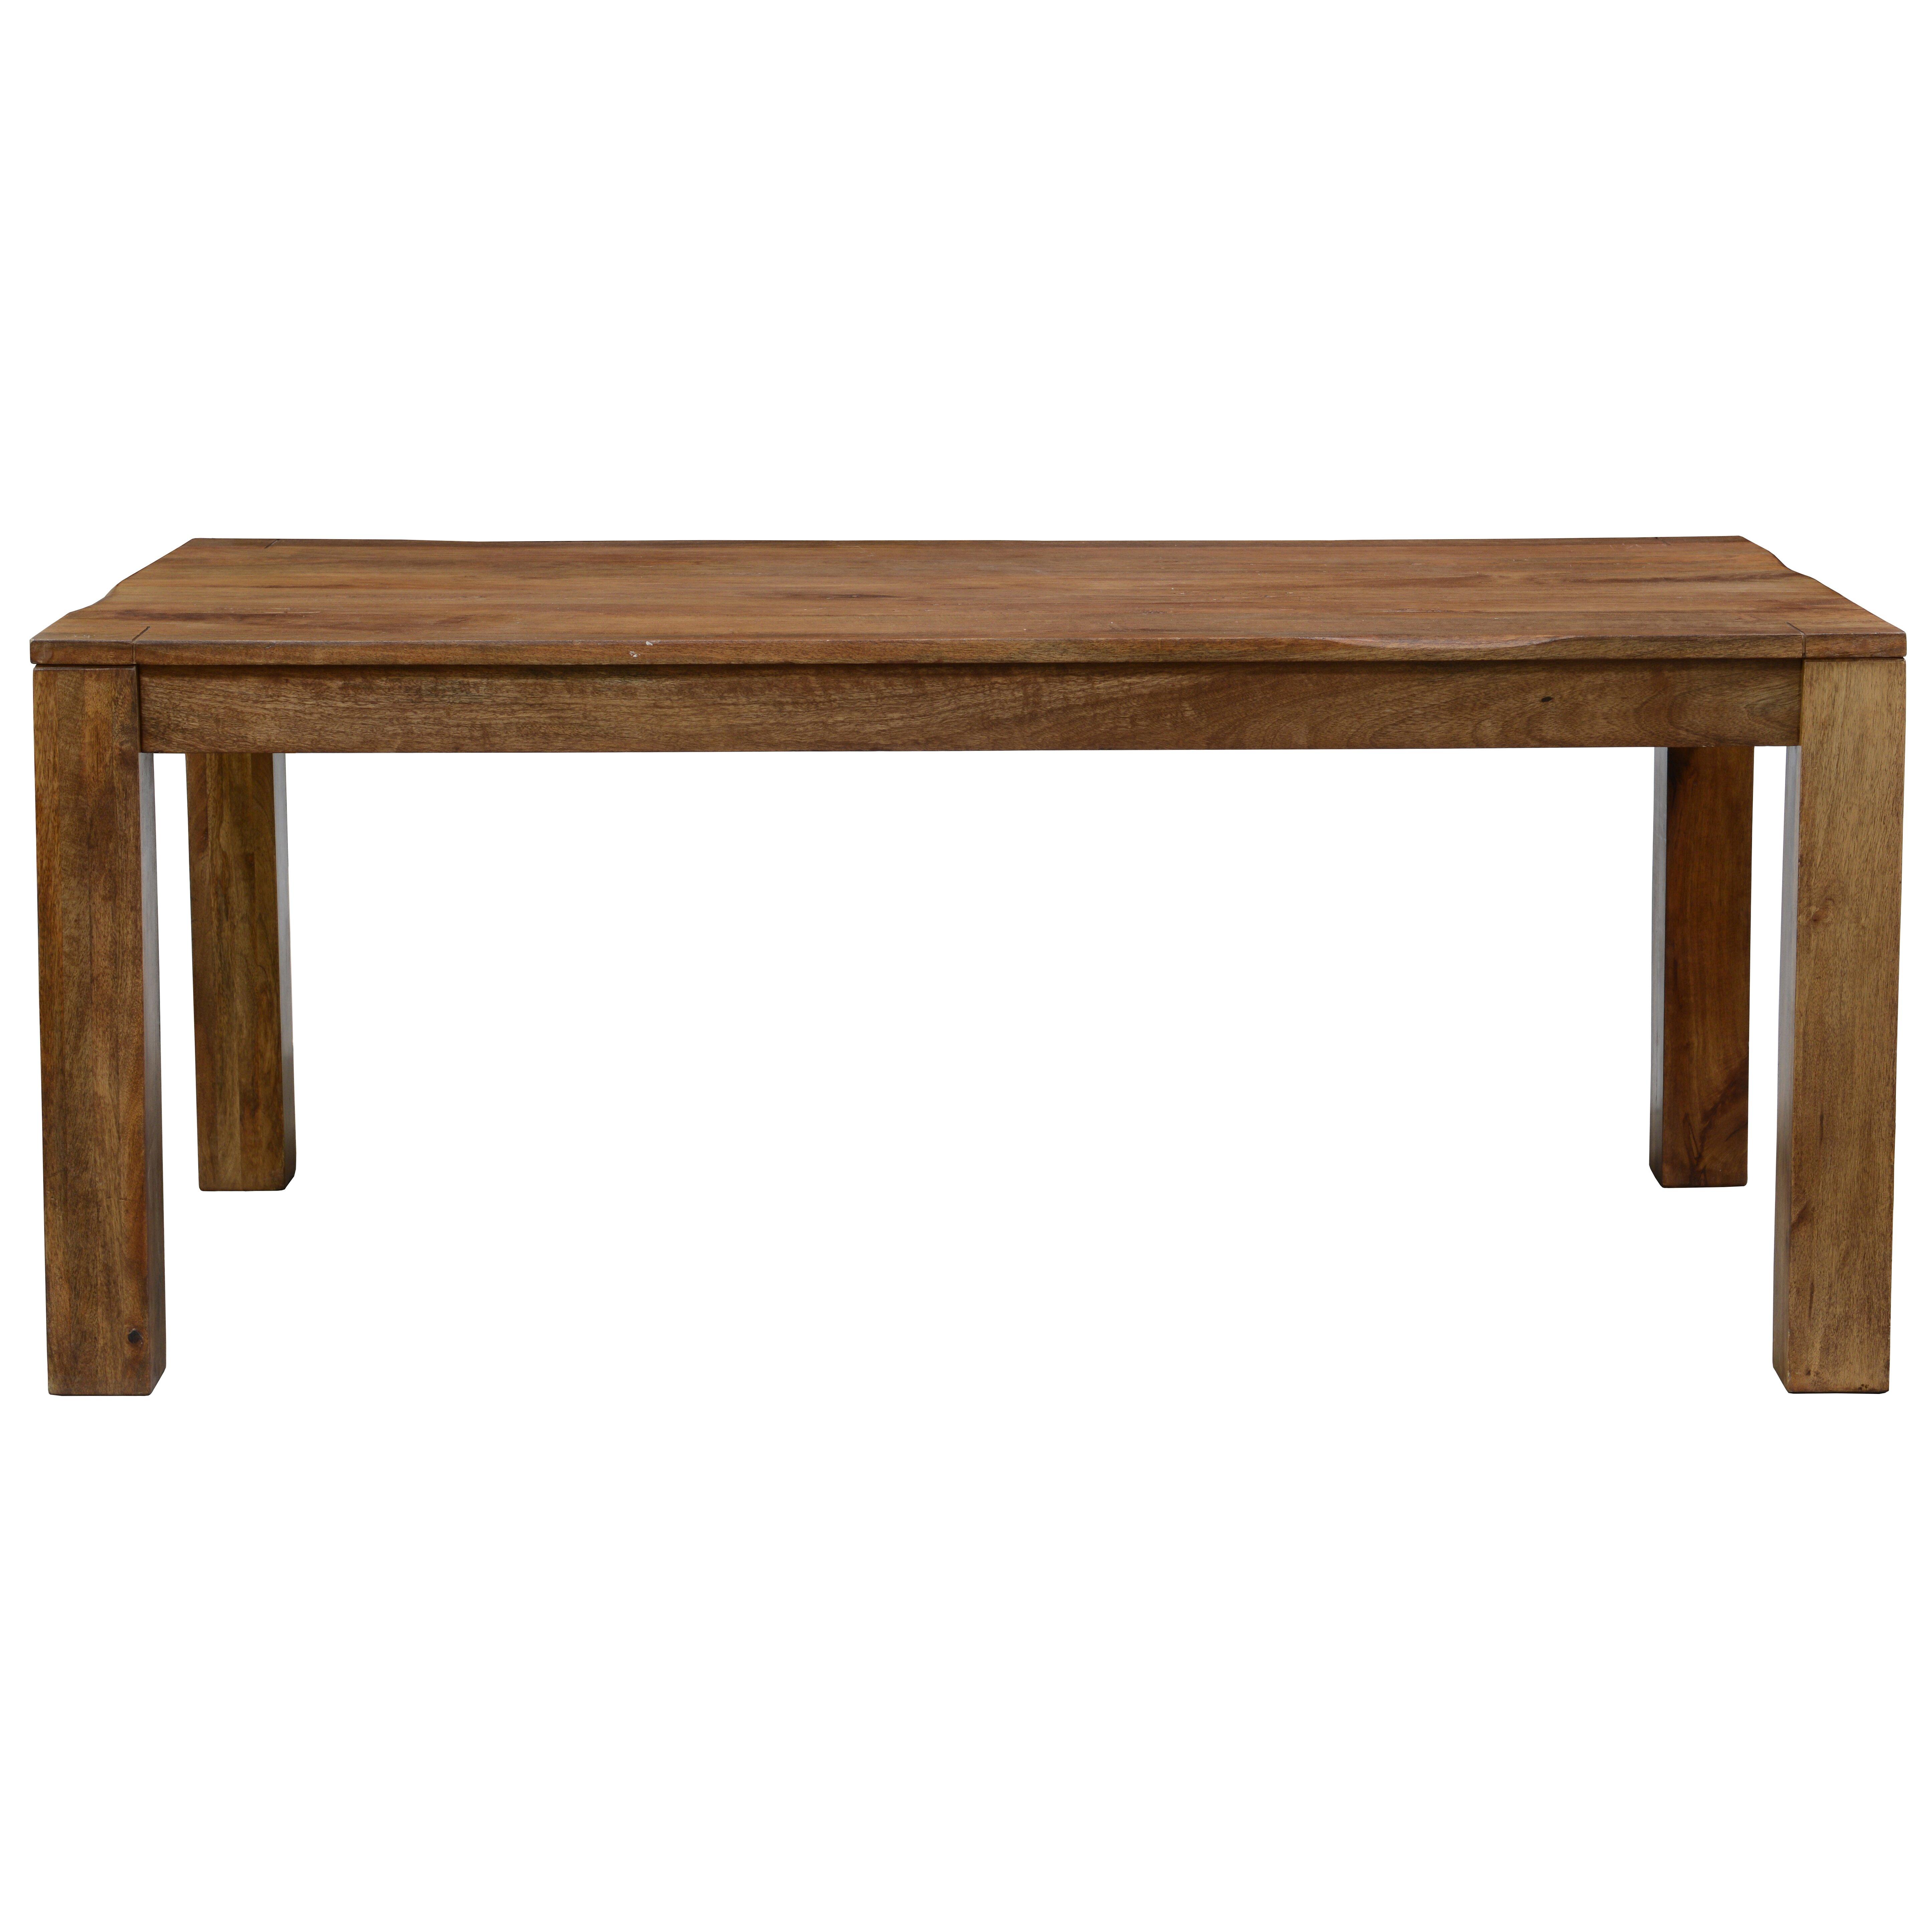 Laurel Foundry Modern Farmhouse Opheim Wood Kitchen Table Reviews Wayfair